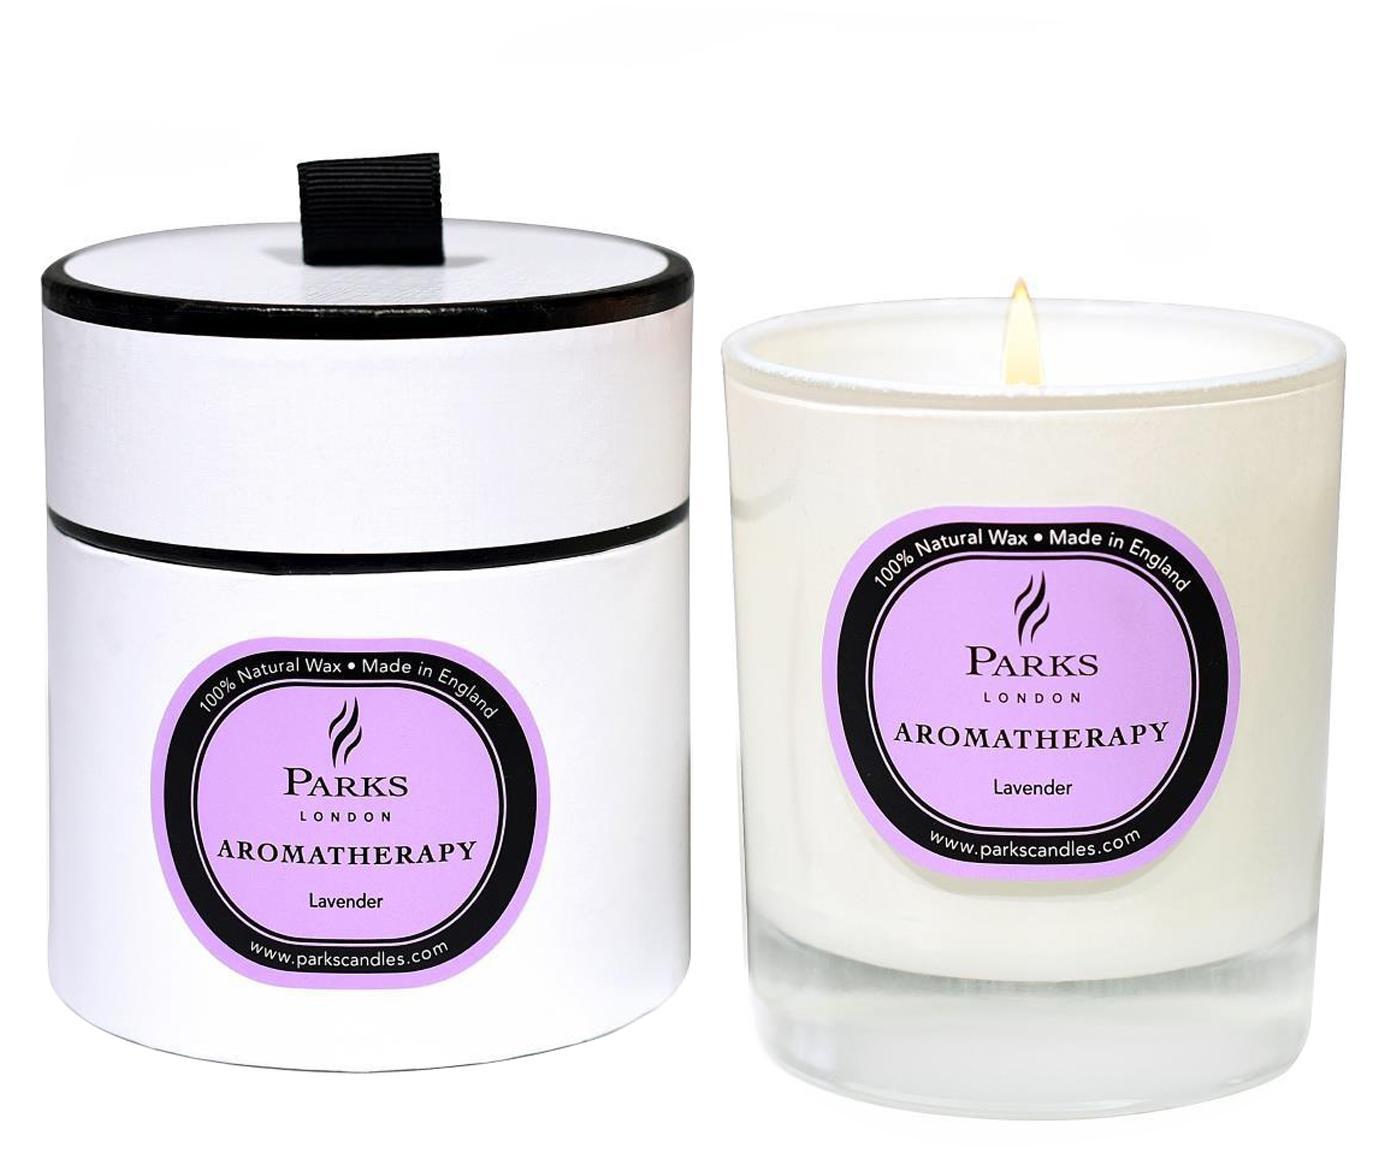 Geurkaars Aromatherapy (lavendel), Houder: glas, Wit, roze, Ø 8 x H 9 cm